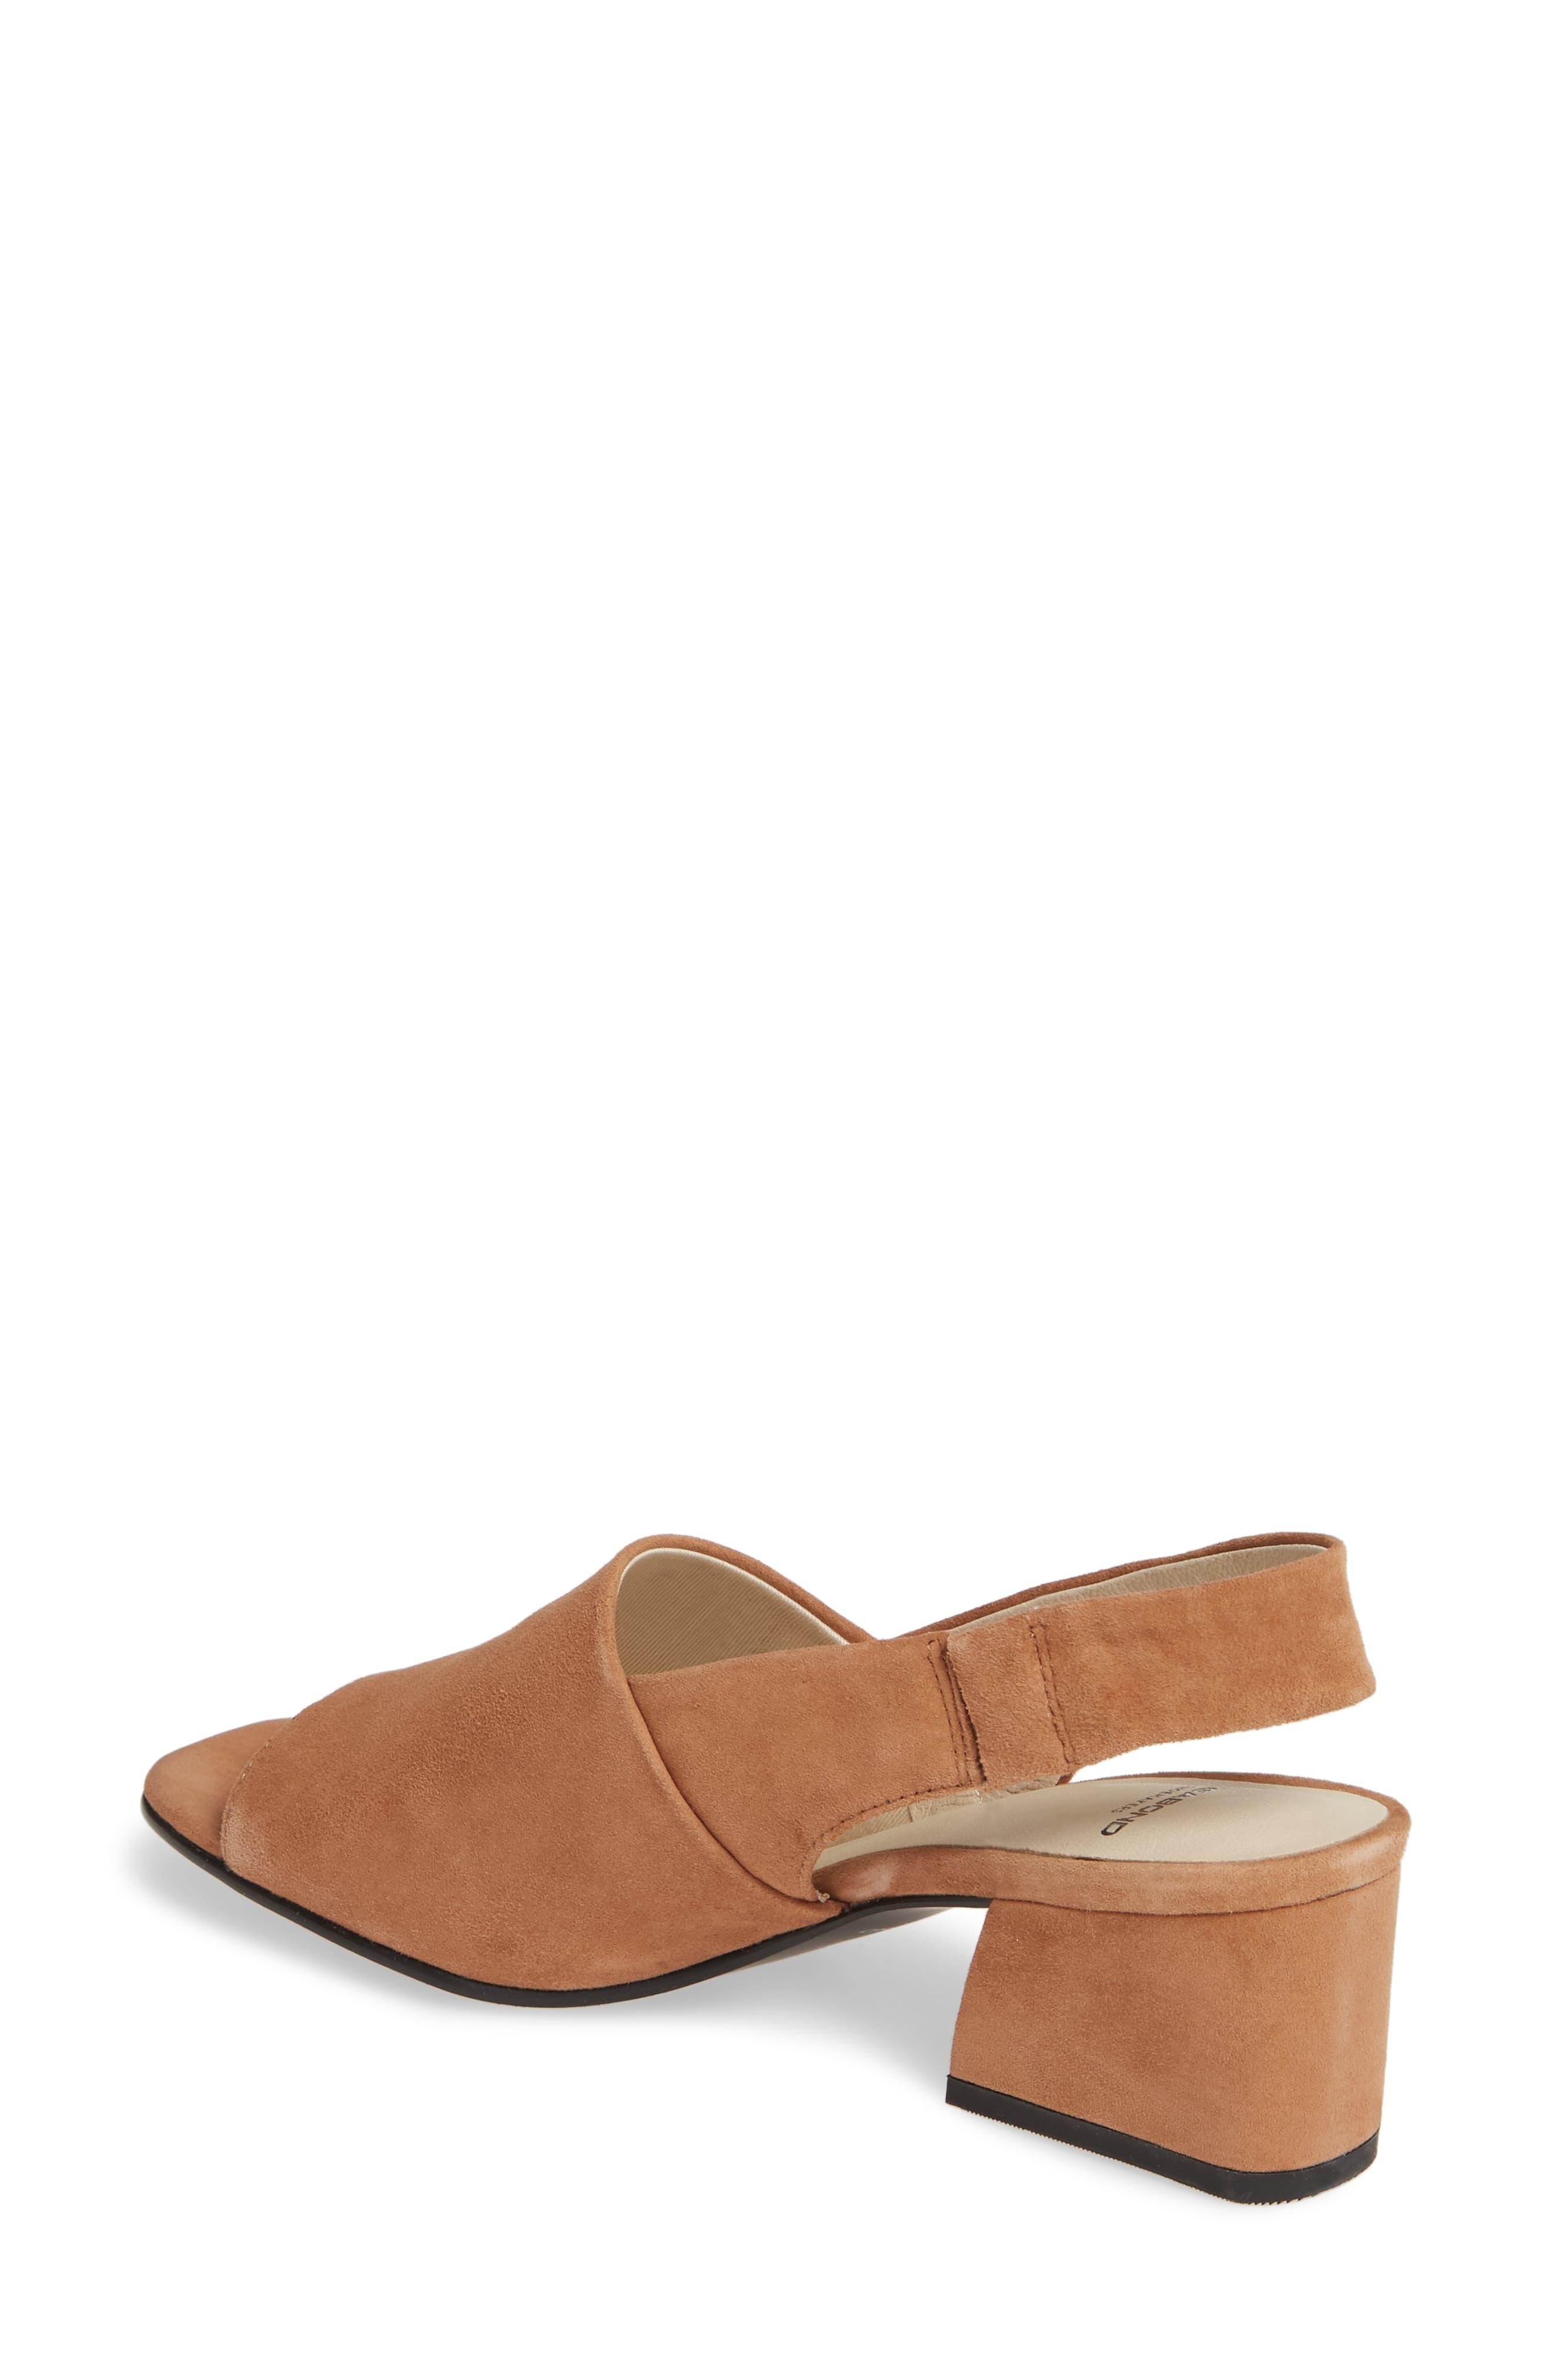 979255cc23 Vagabond - Multicolor Shoemakers Elena Slingback Sandal - Lyst. View  fullscreen